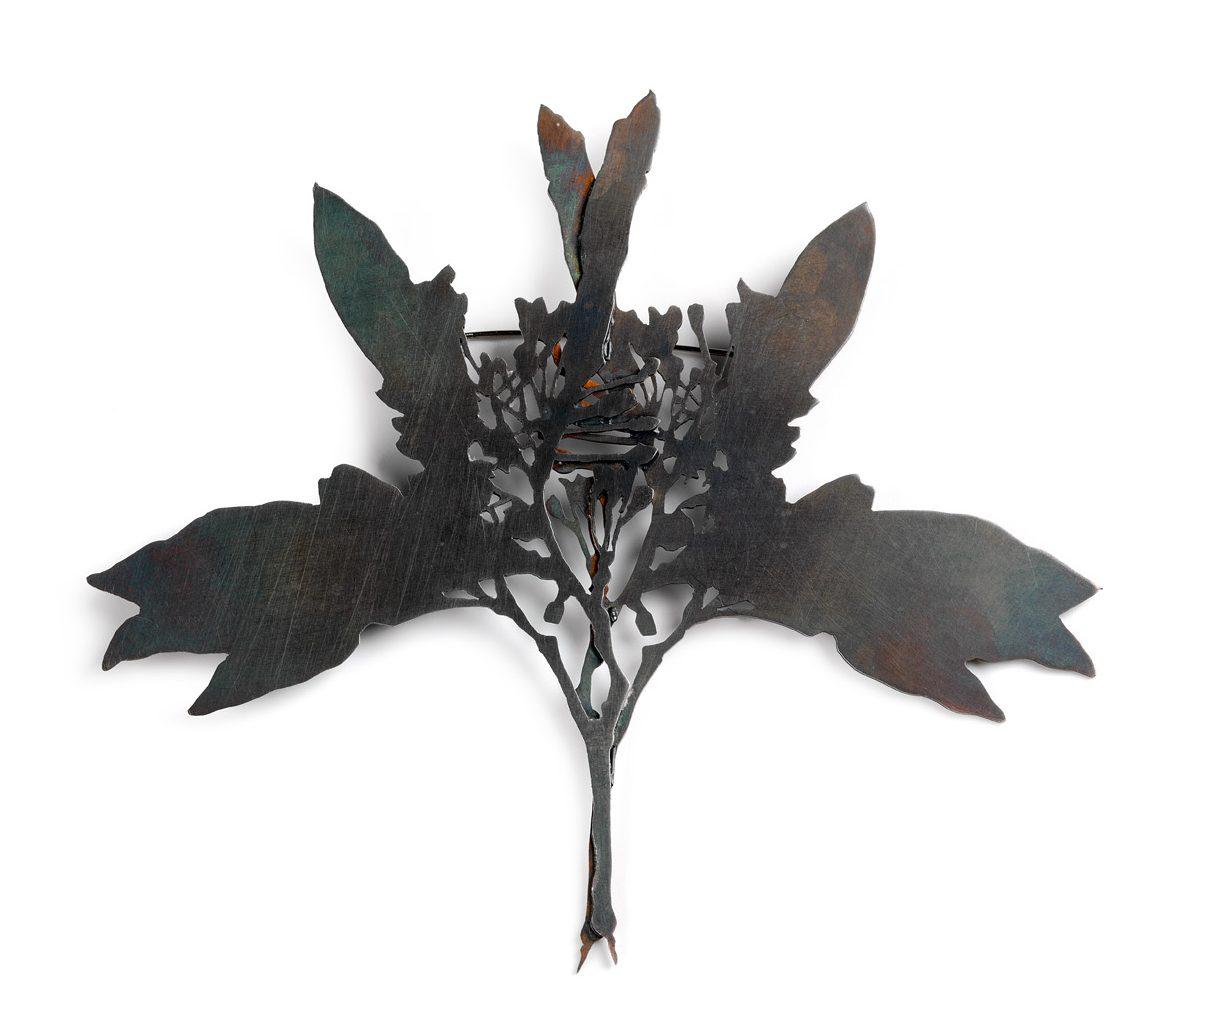 Marian Hosking, Blueberry ash, broche, 2008. Collectie Daalder. Foto Grant Hancock, metaal